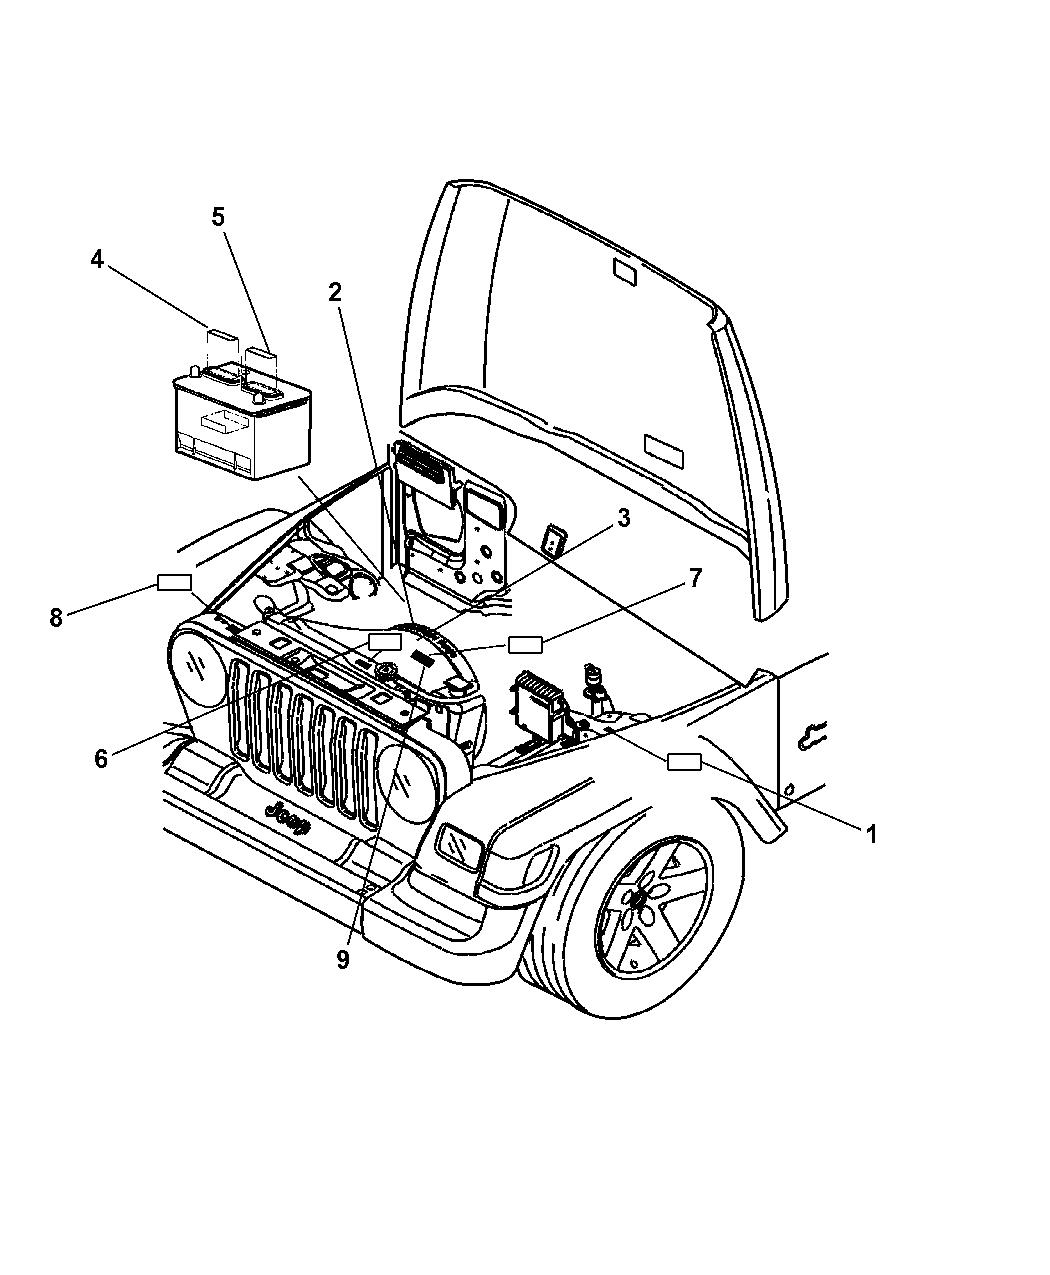 label emission 2006 jeep wrangler parts diagram 2005 jeep wrangler engine diagram #11